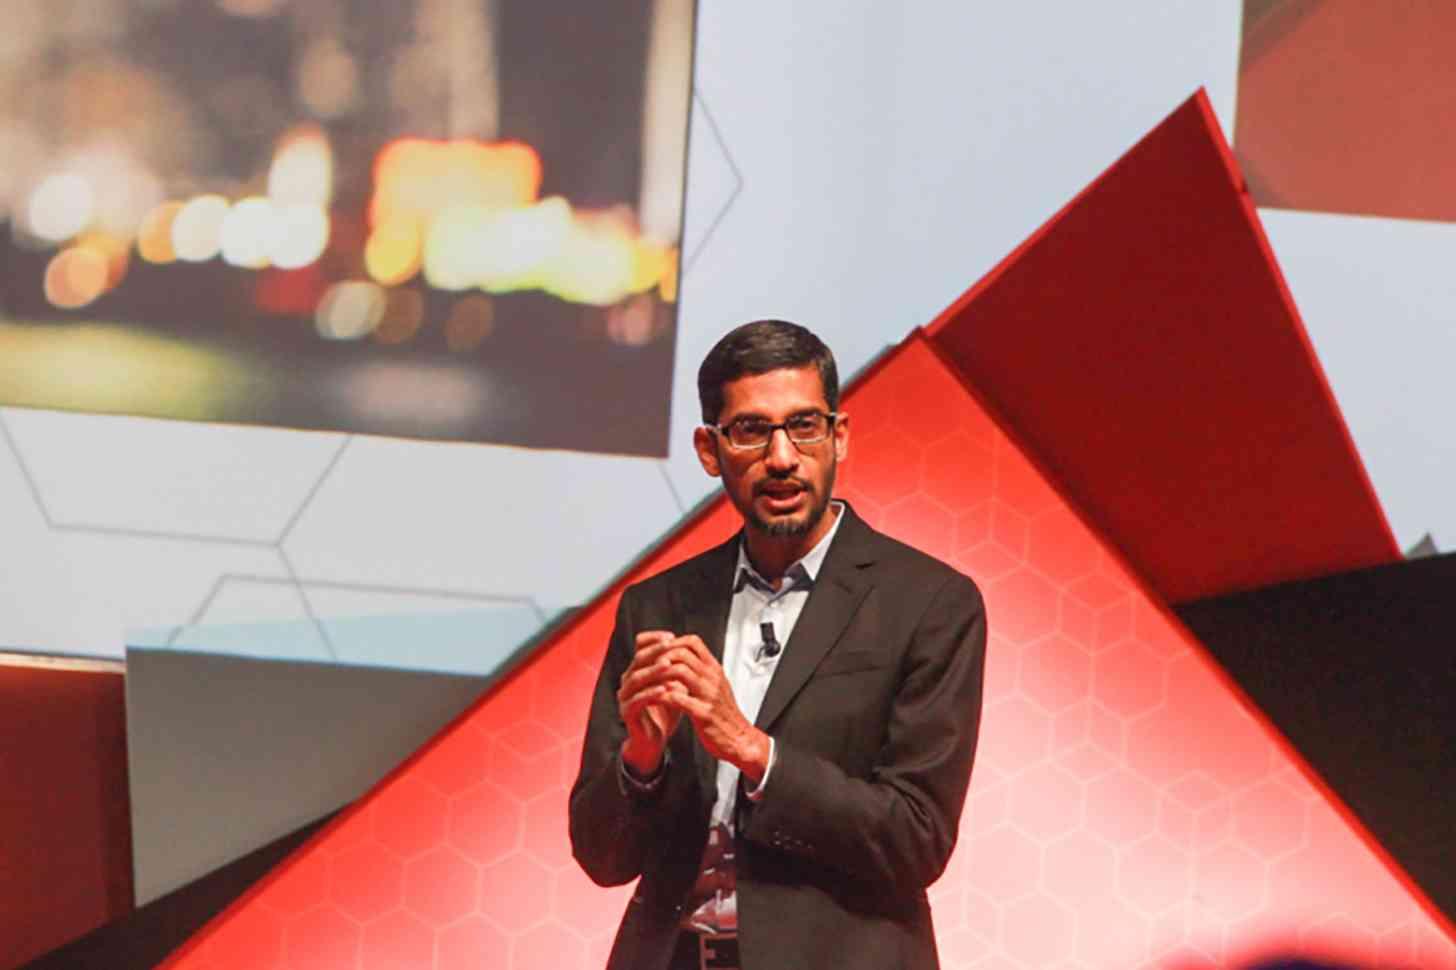 Google Sundar Pichai MWC 2015